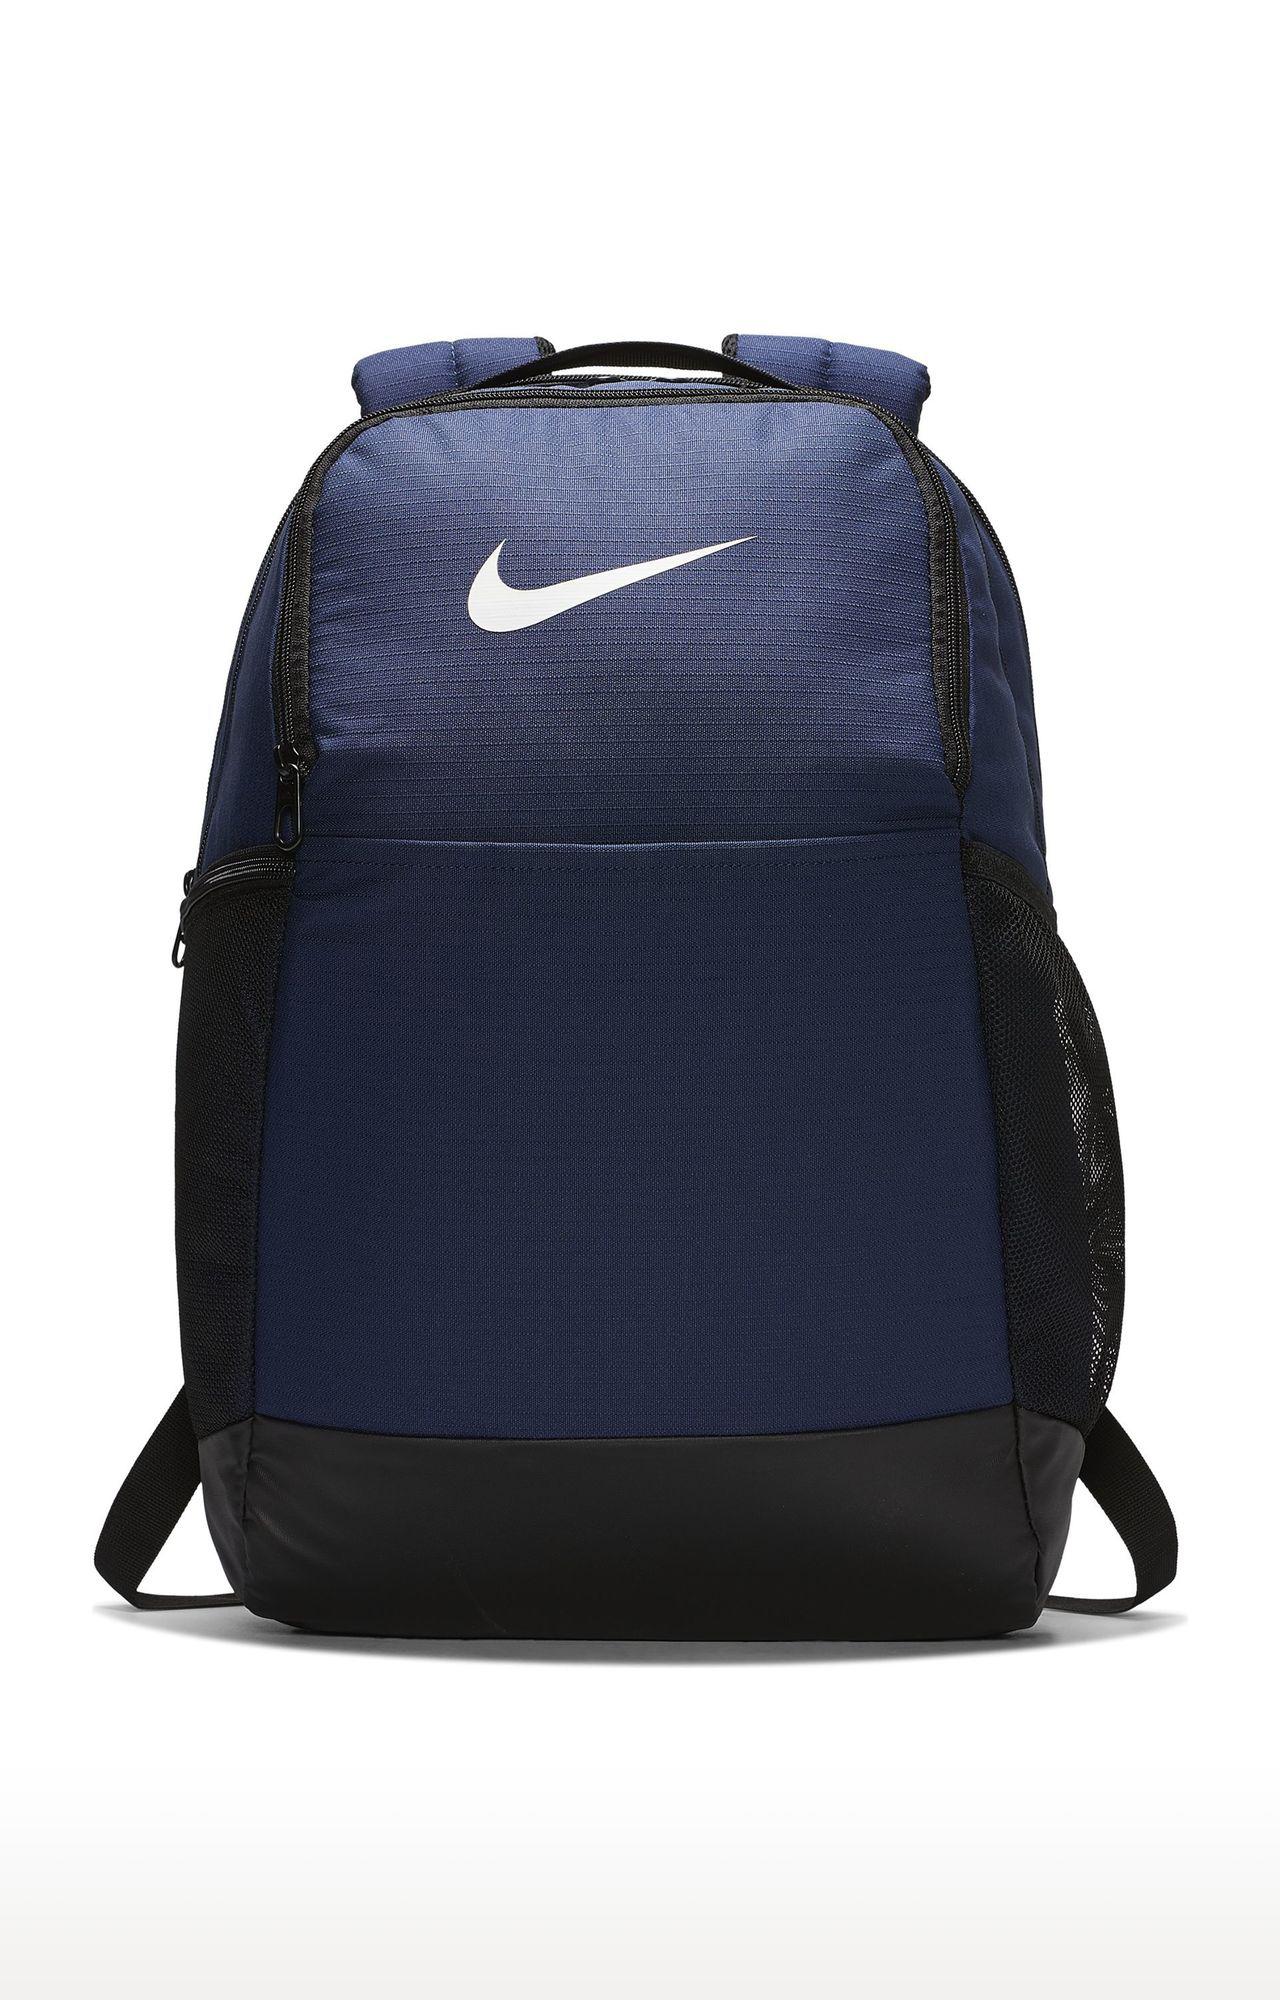 Nike | NIKE NK BRSLA M BKPK - 9.0 (24L) BCKPK